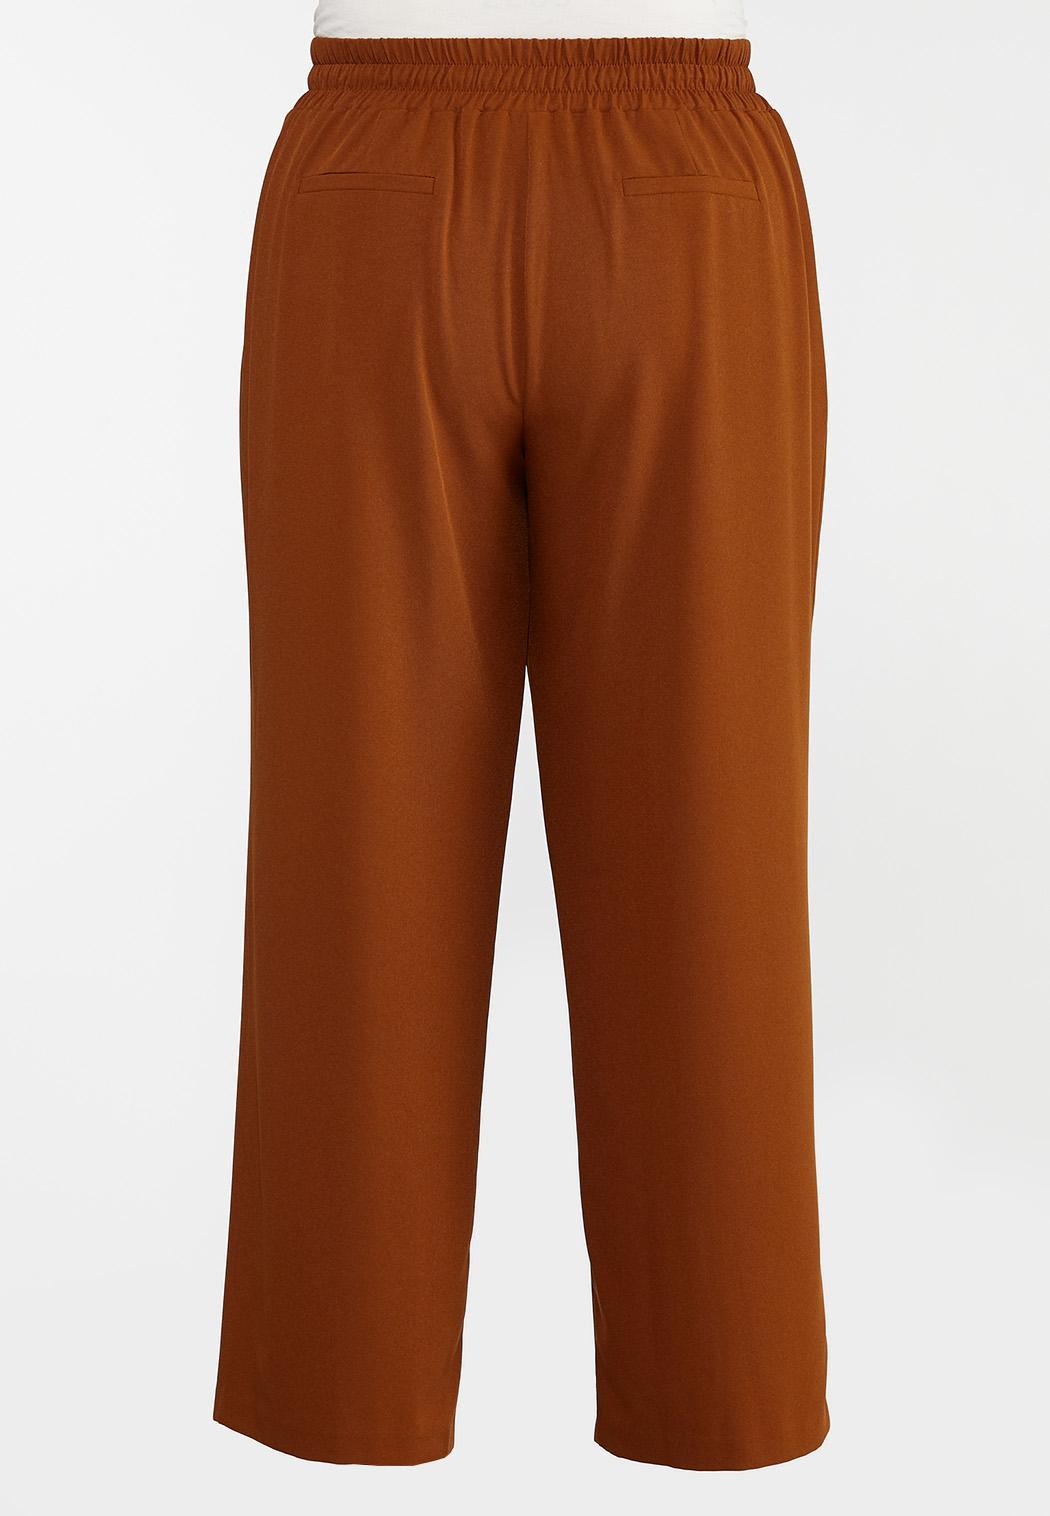 Plus Size Caramel Wide Leg Trouser Pants (Item #44356525)